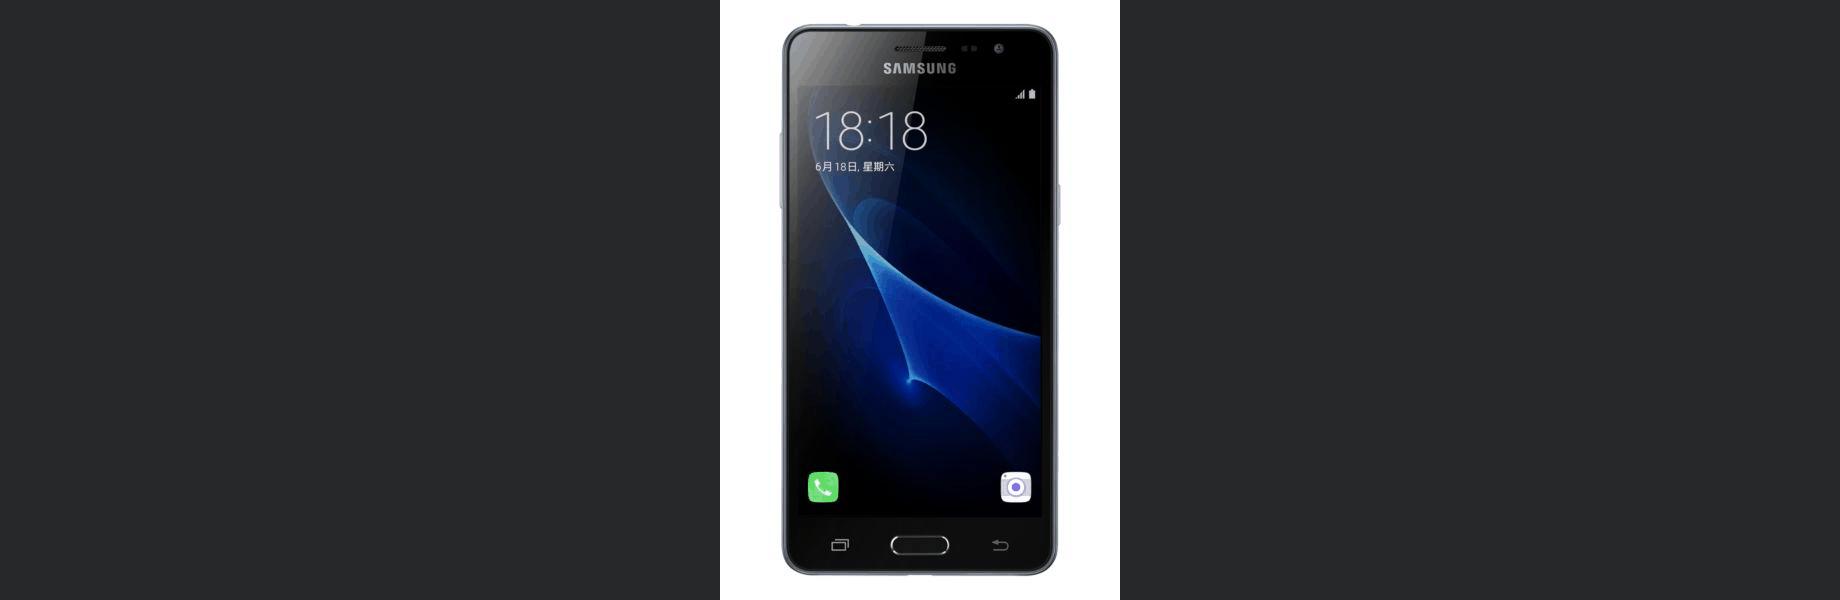 Samsung Galaxy J3 Pro 5